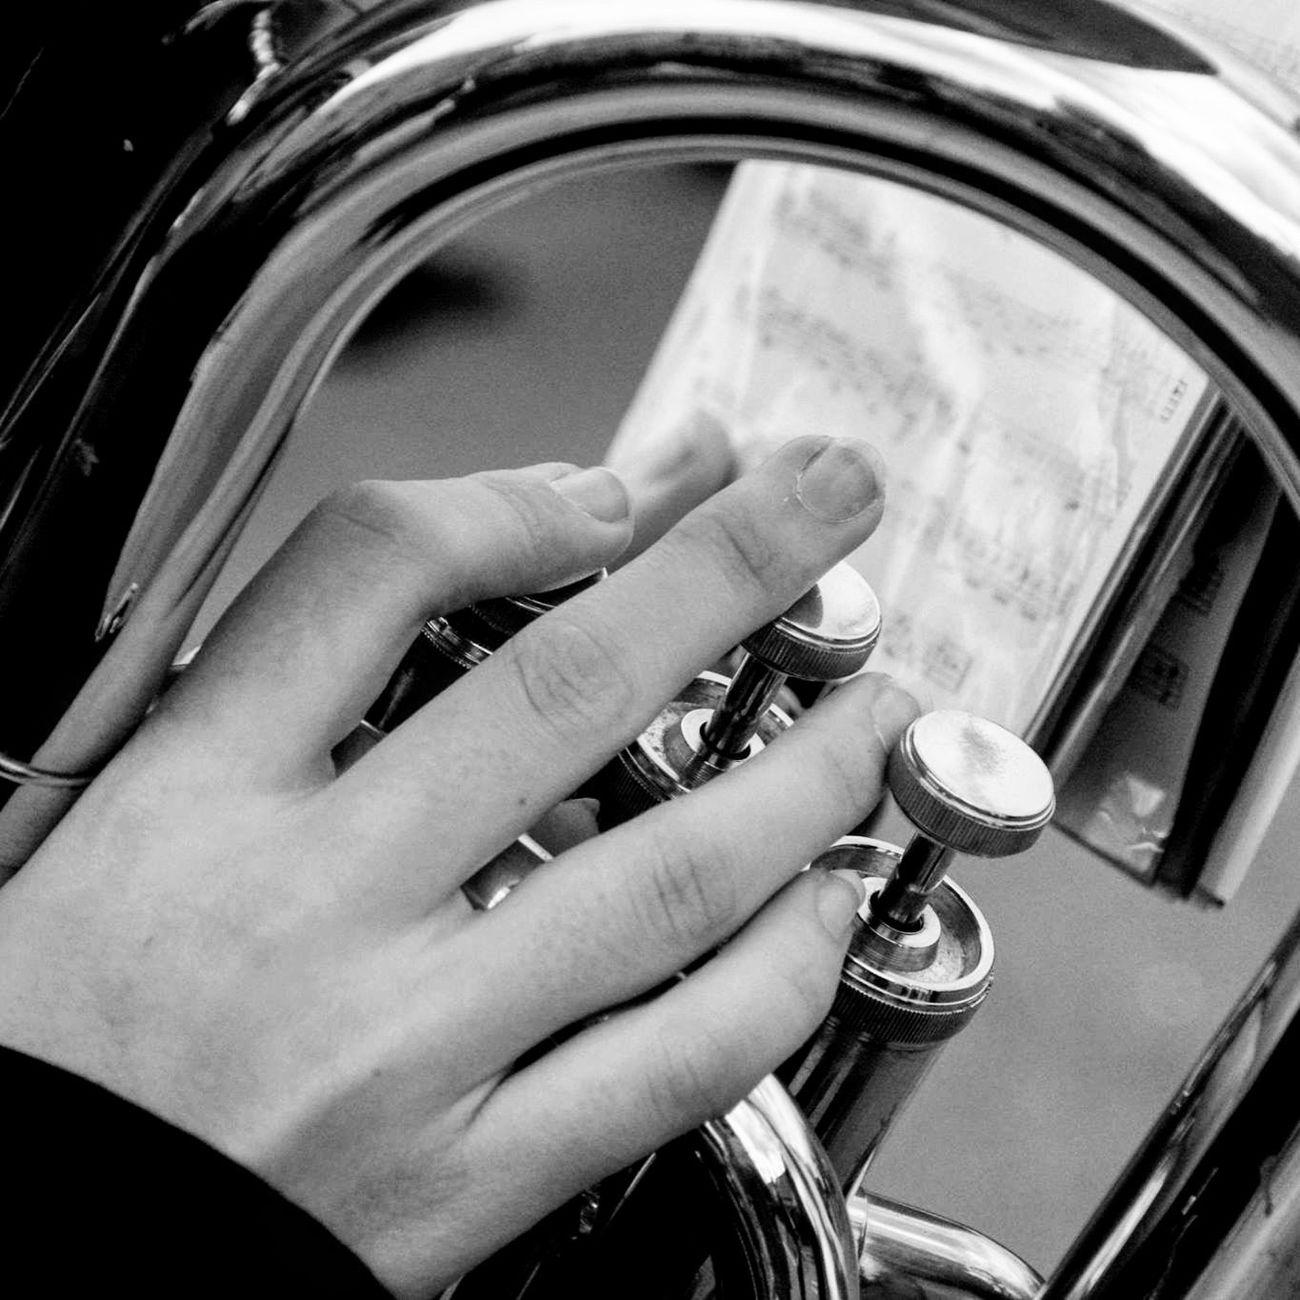 Musique Music Musicien Musician Main Hand Noiretblanc Blackandwhite